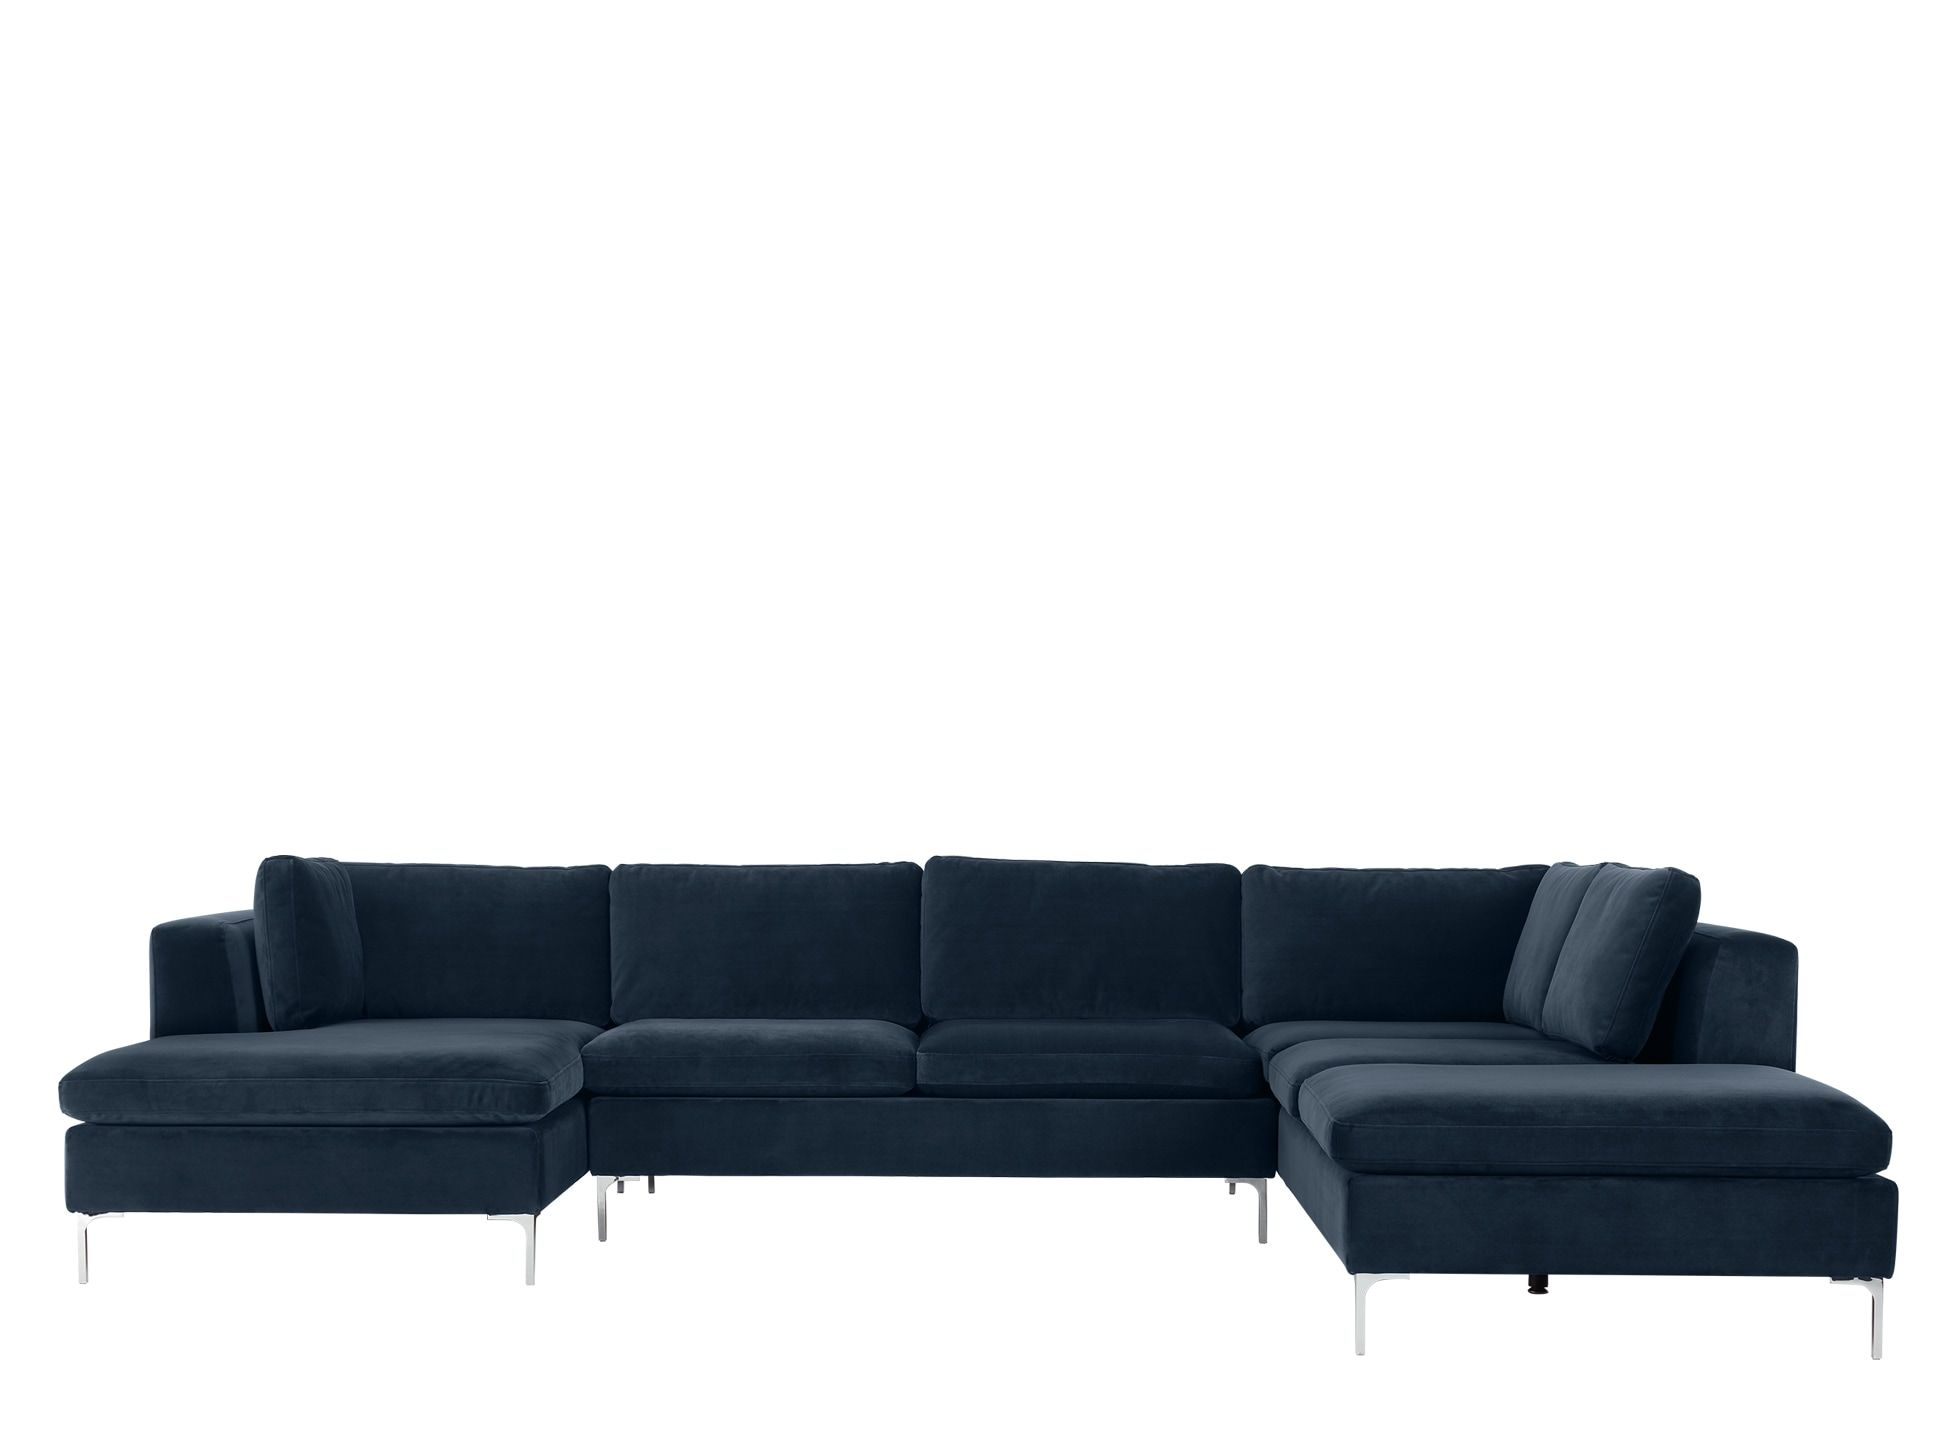 Monterosso Right Hand Facing Corner Sofa Sapphire Blue Velvet Avec Images Canape Angle Canape Angle Convertible